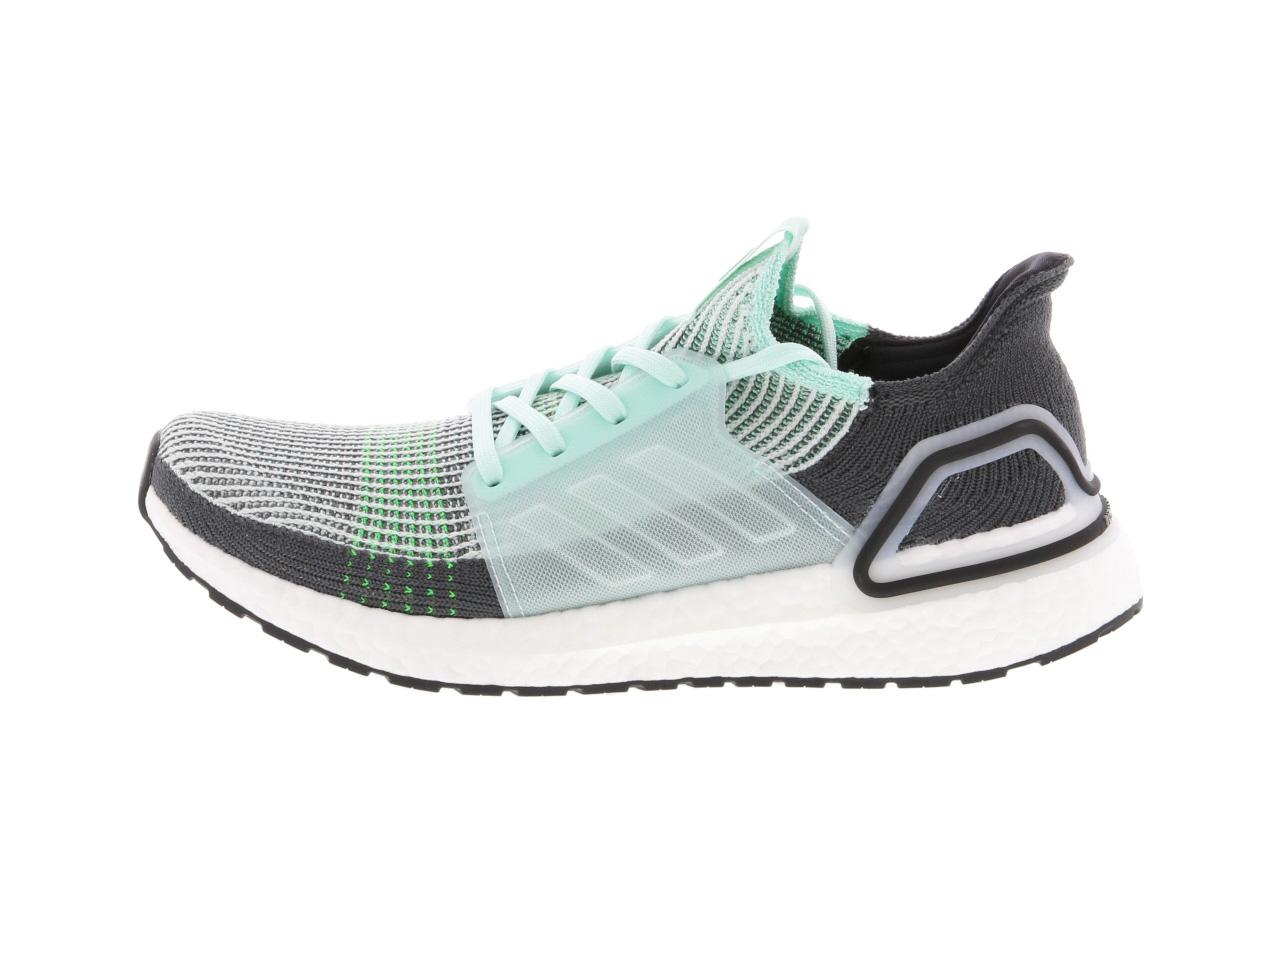 【50%OFF!】adidas UltraBOOST 19(F35244)【アディダス】【メンズファッション】【シューズ】【スニーカー】【靴】【フットウェア】